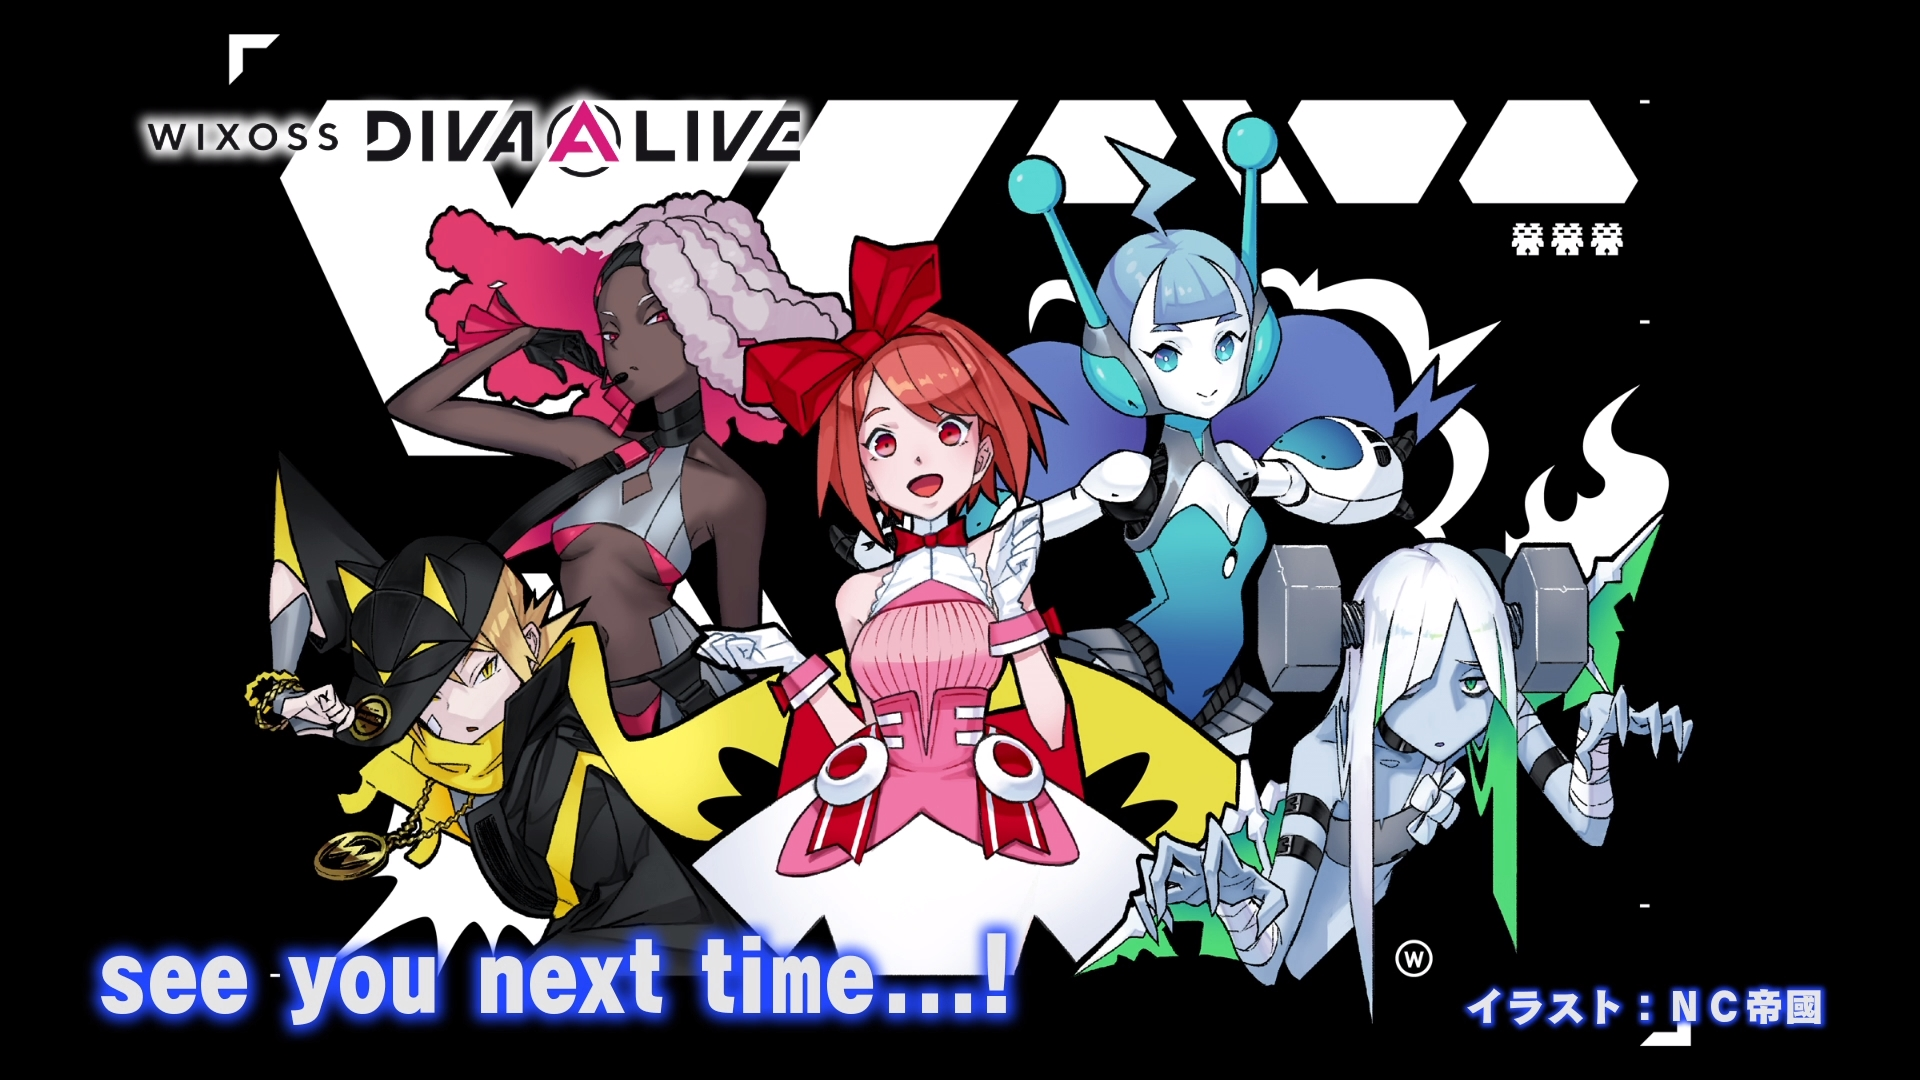 WIXOSS Diva(A)Live Episode 04 NC Empire